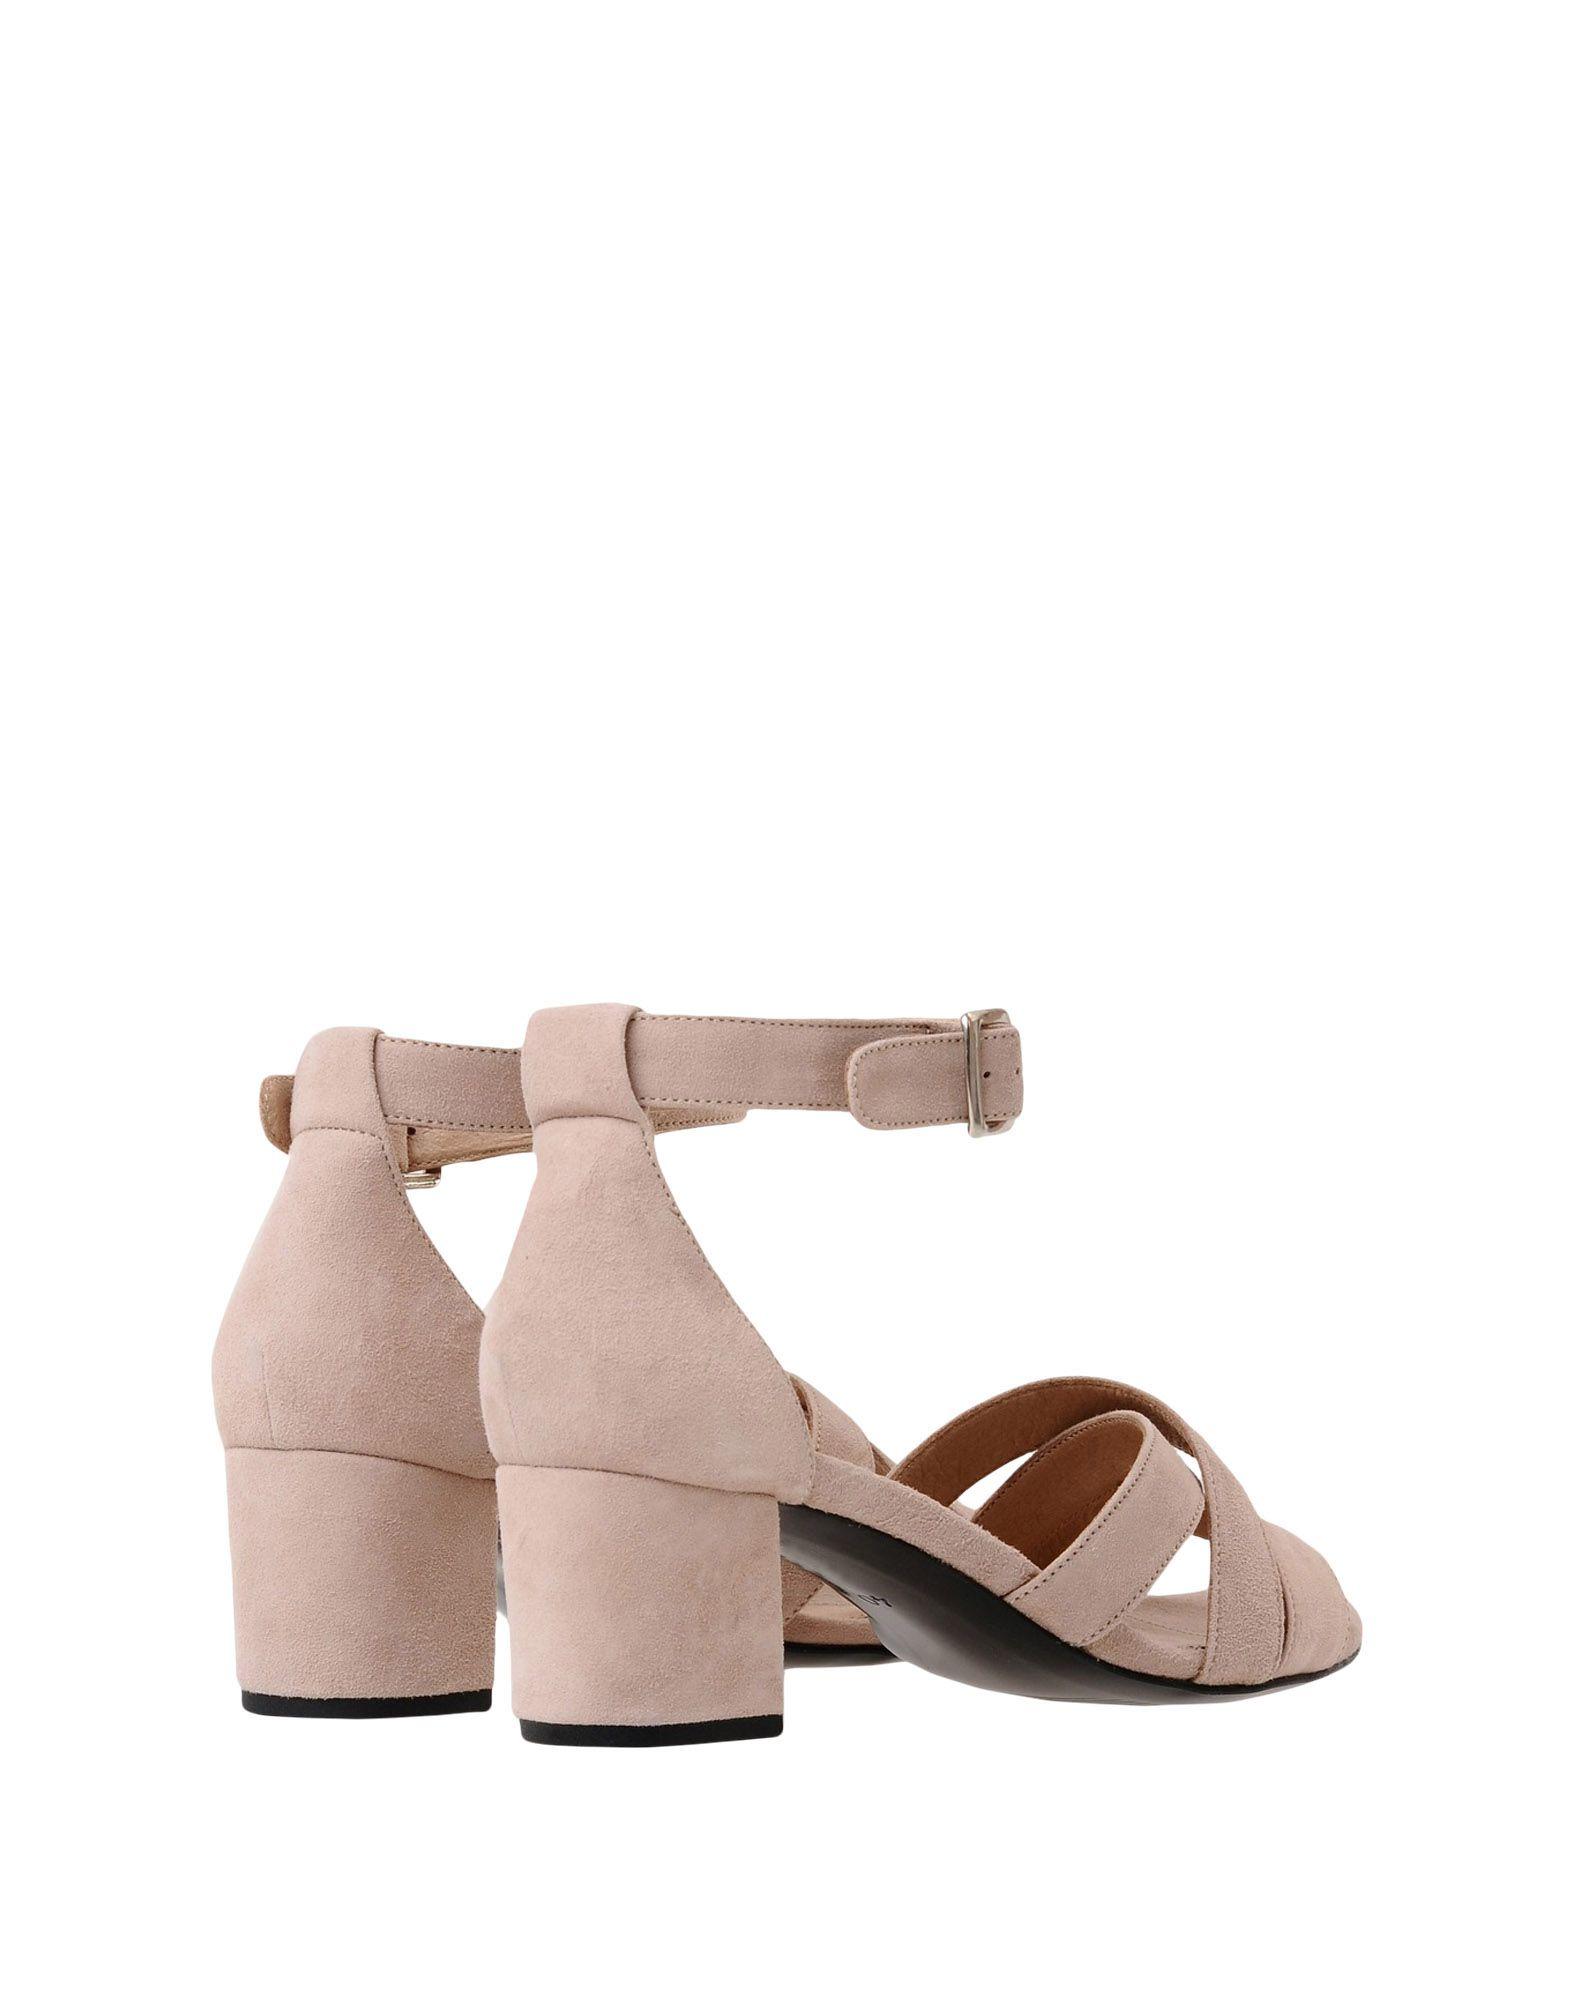 Twist & Tango Nice Sandal  11457629WJ Gute Qualität beliebte Schuhe